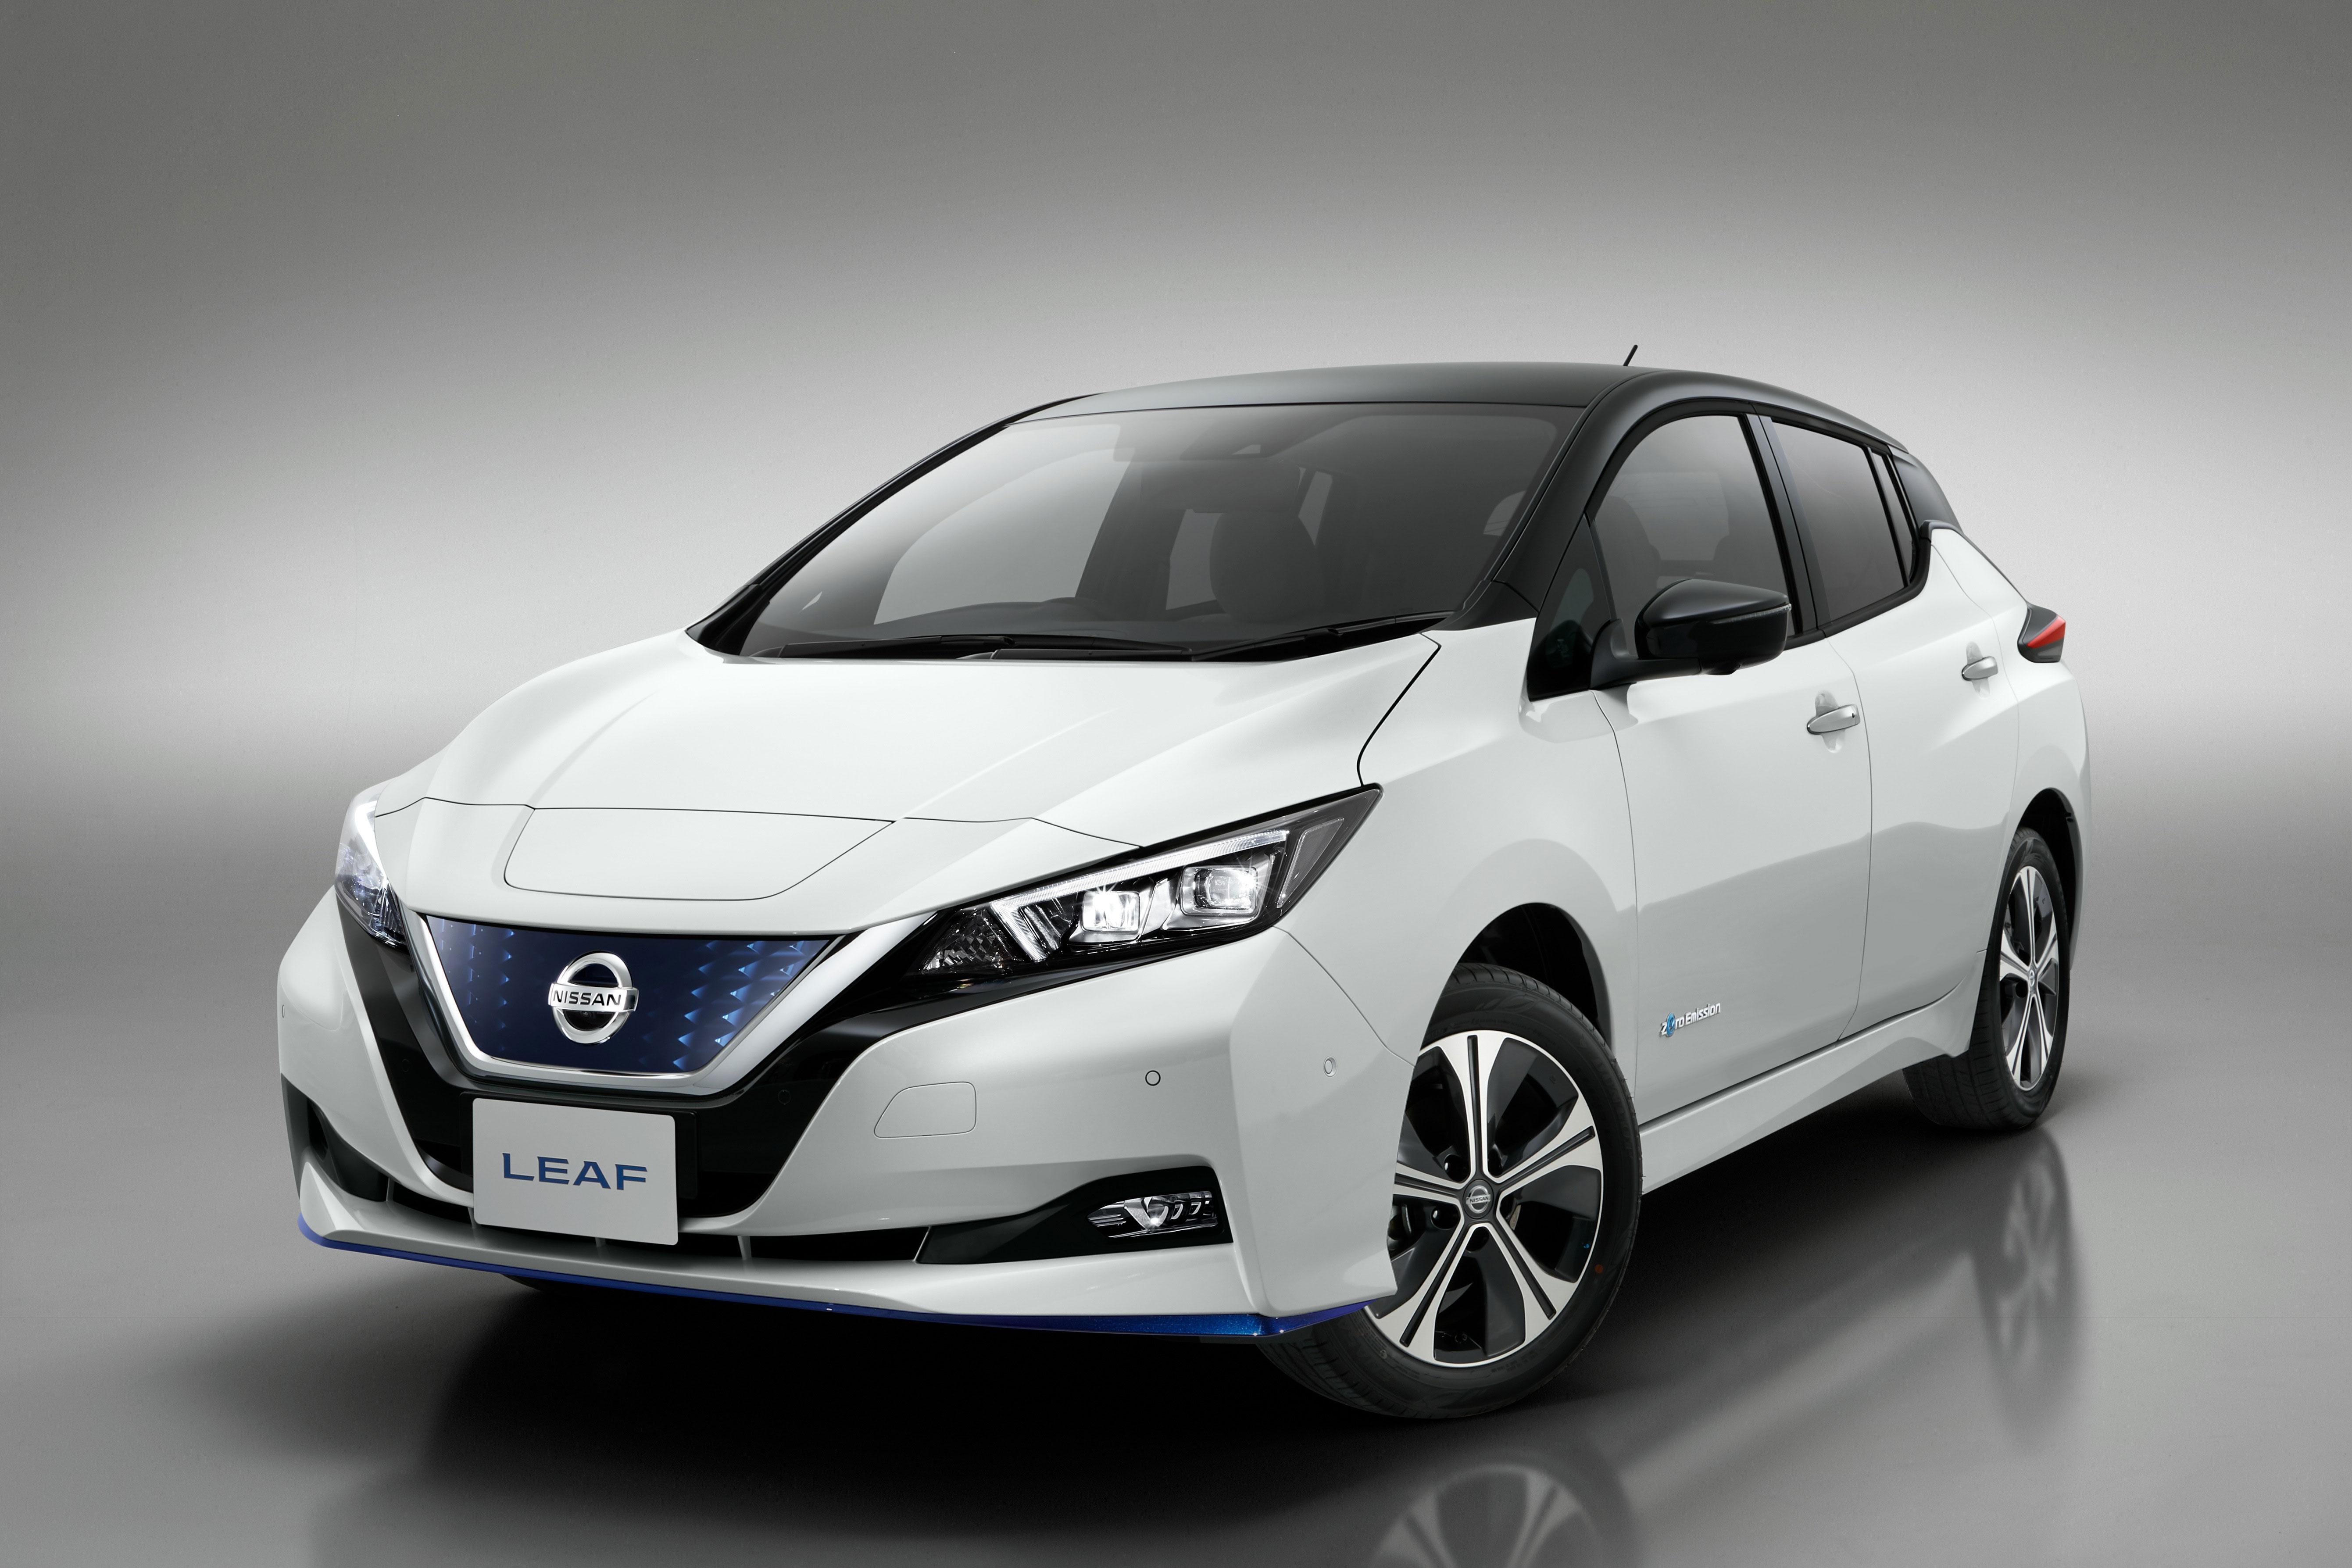 Nissan και EDF Group συνεργάζονται για το EV και την ολοκλήρωση του δικτύου φόρτισης στην Ευρώπη